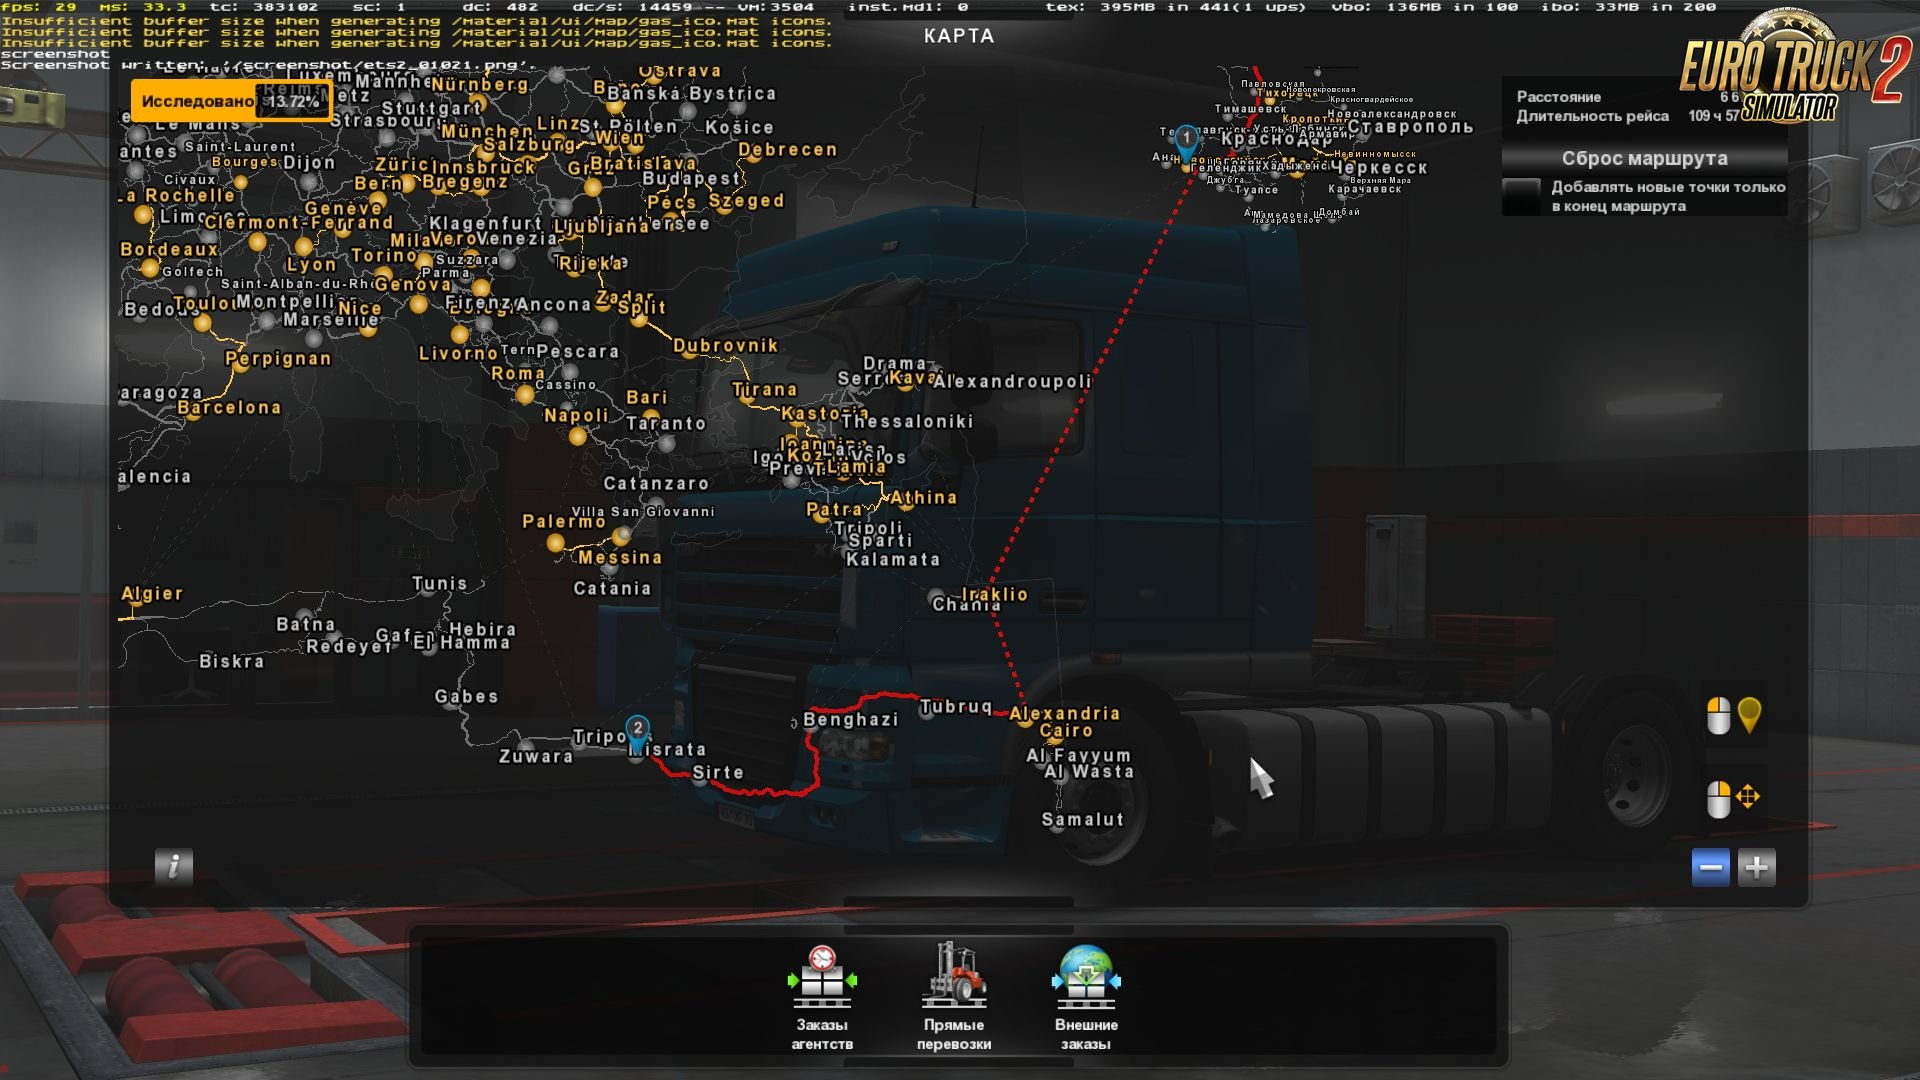 Ferry S.Region - TSM 6.6.2